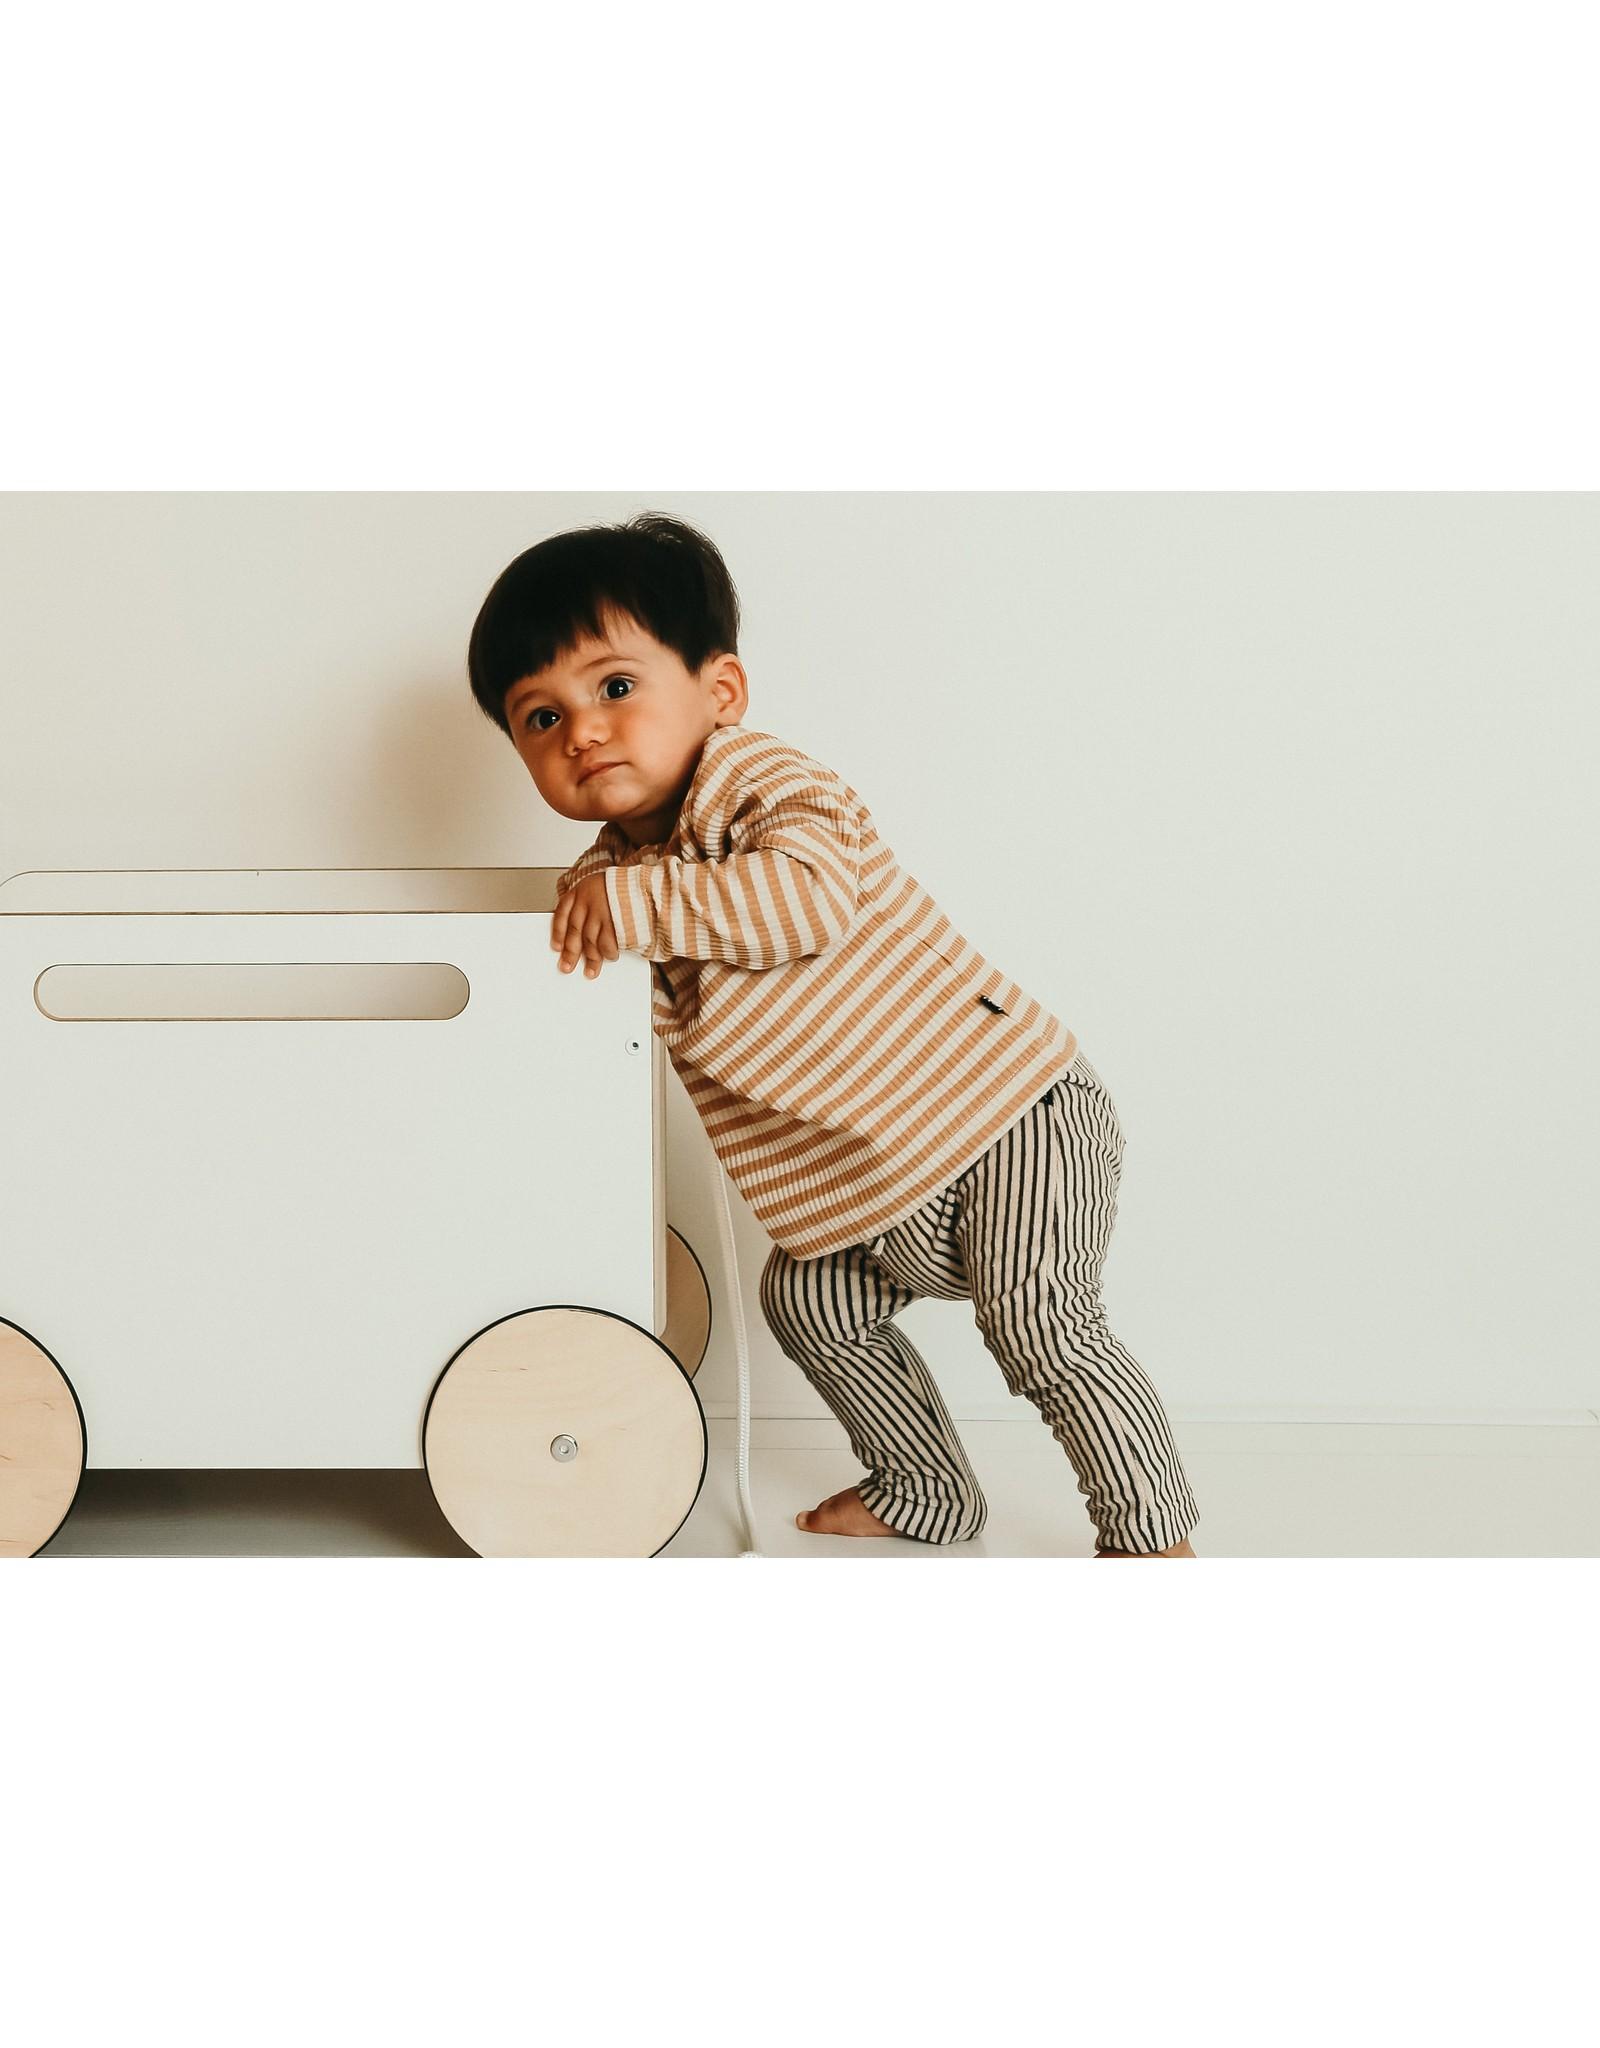 House of Jamie HOJ Baby Pants Charcoal Sheer Stripes